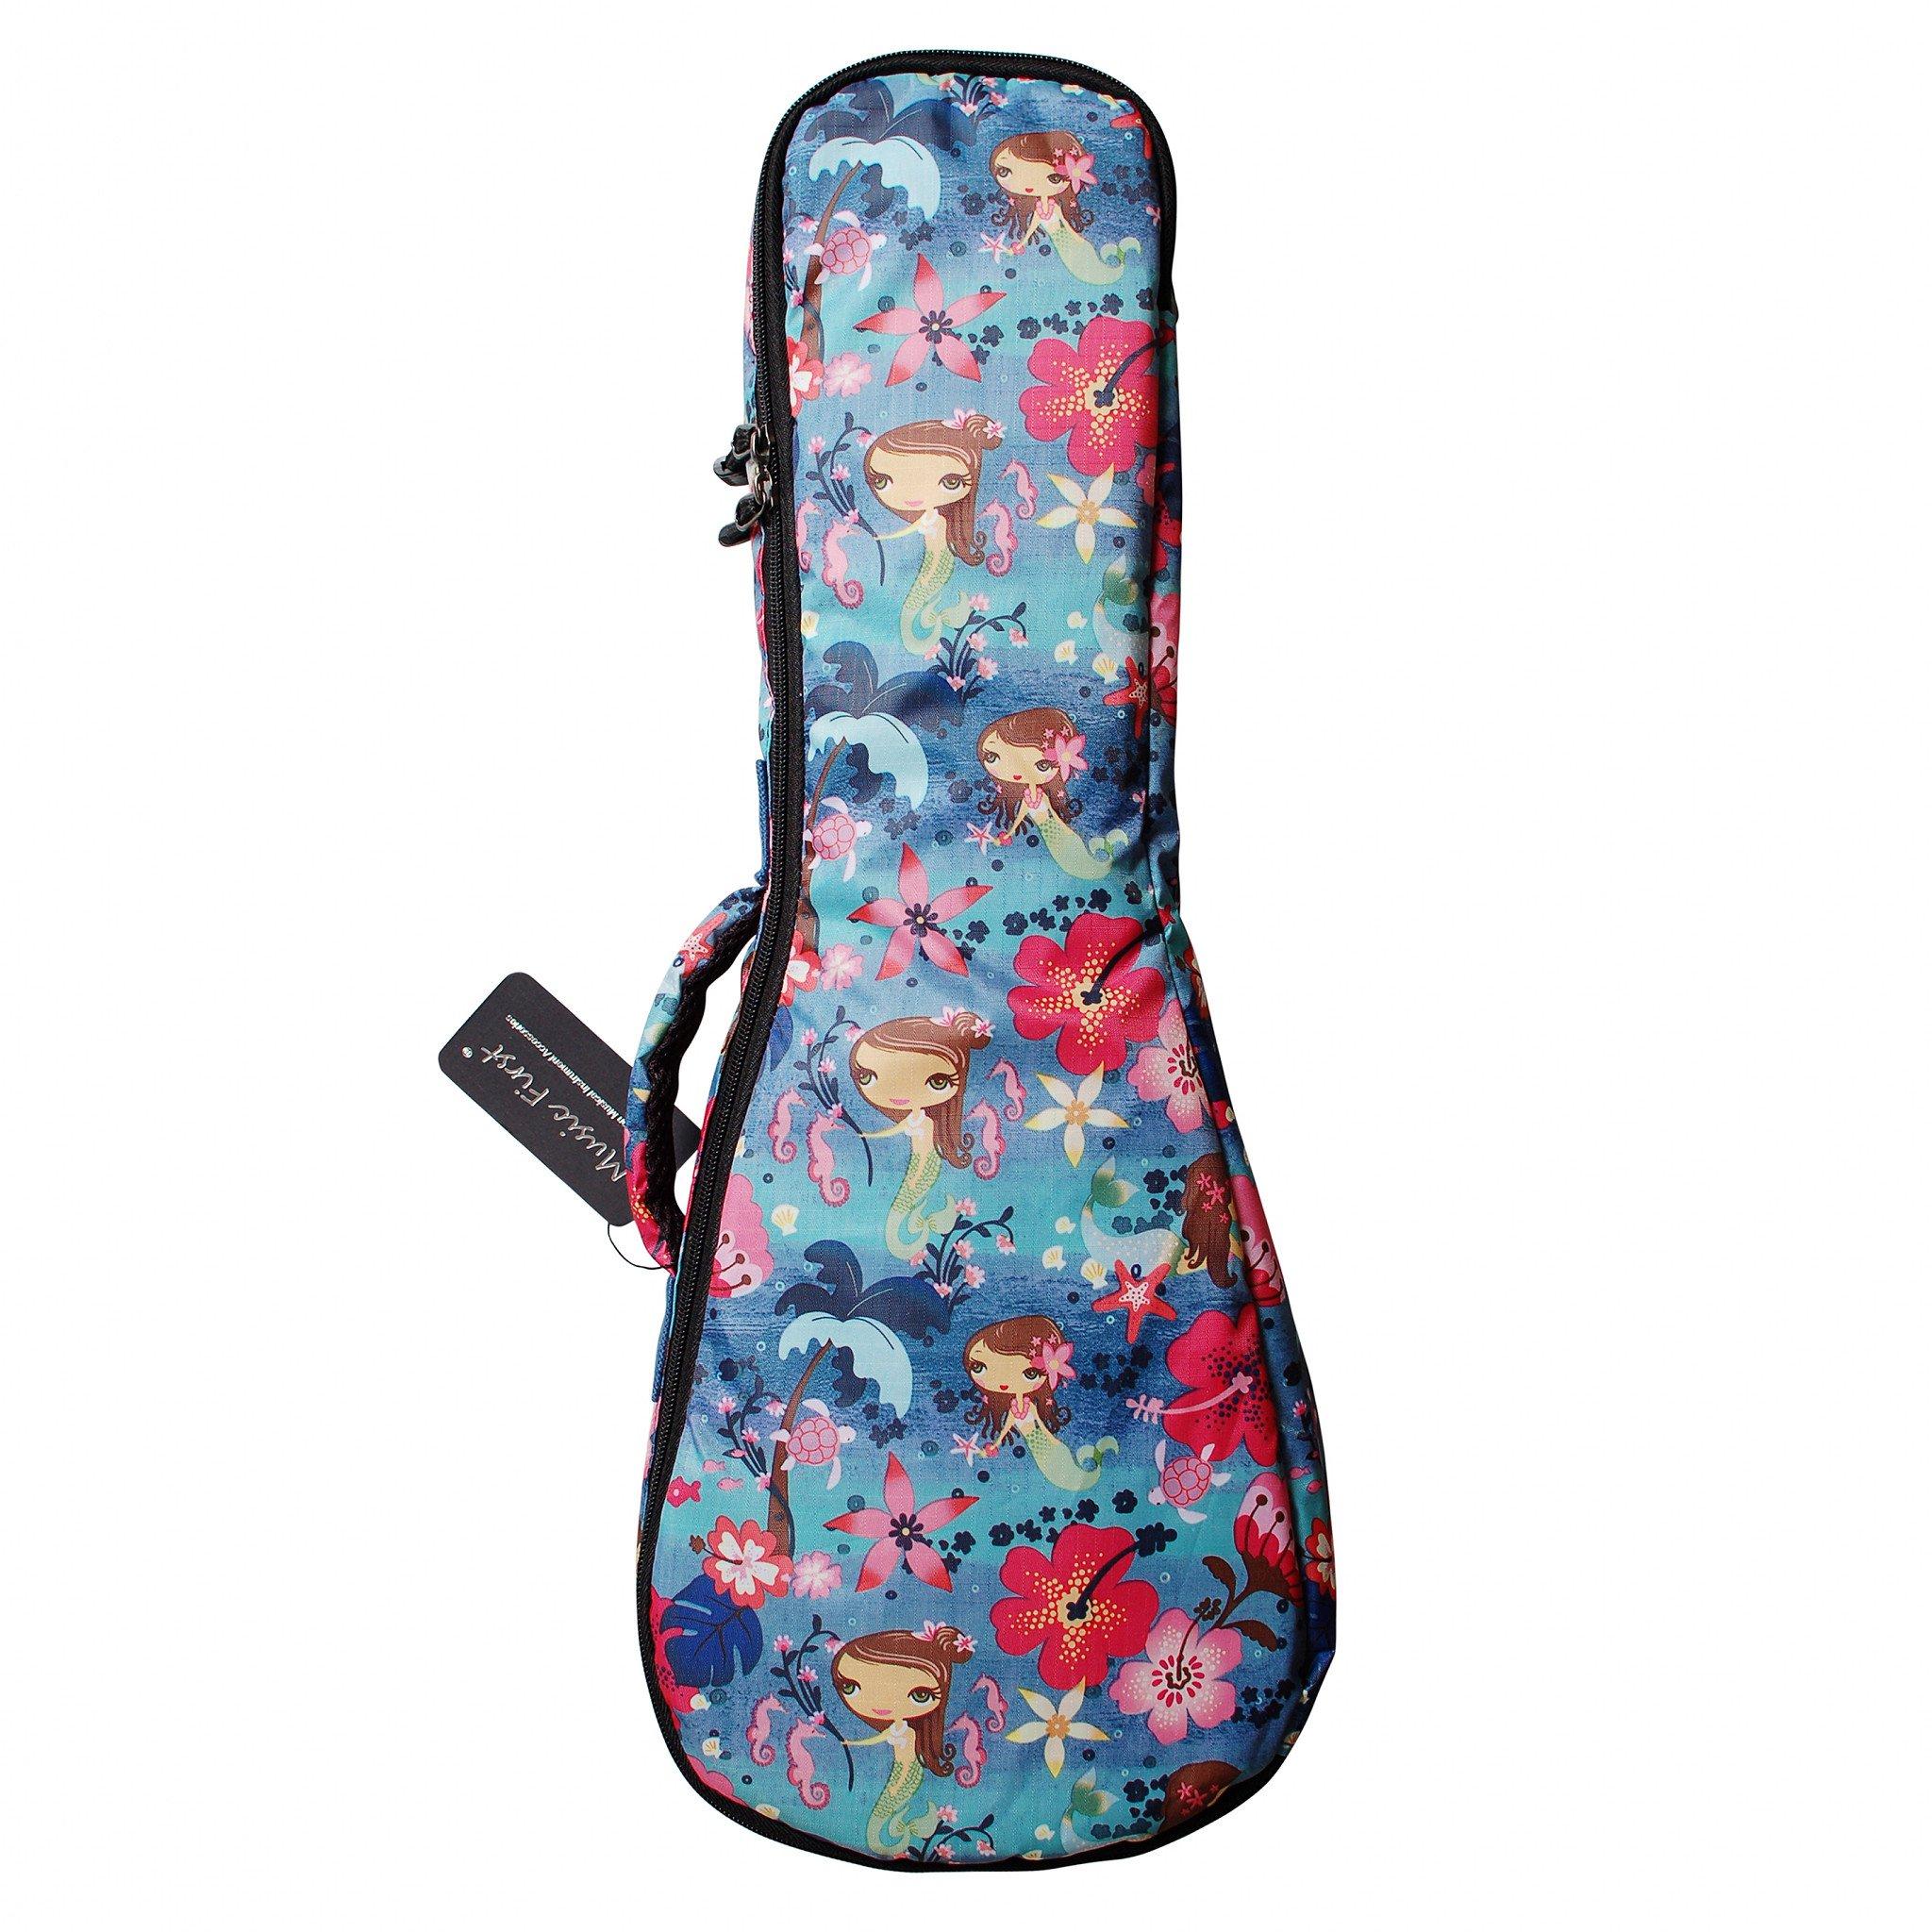 "MUSIC FIRST Ocean Blue ""Little Mermaid"", Ukulele Bag Ukulele Case Ukulele Cover, New Arrial, Original Design, Best Gift! (23/24 inch Concert, Ocean Blue) by MUSIC FIRST (Image #1)"